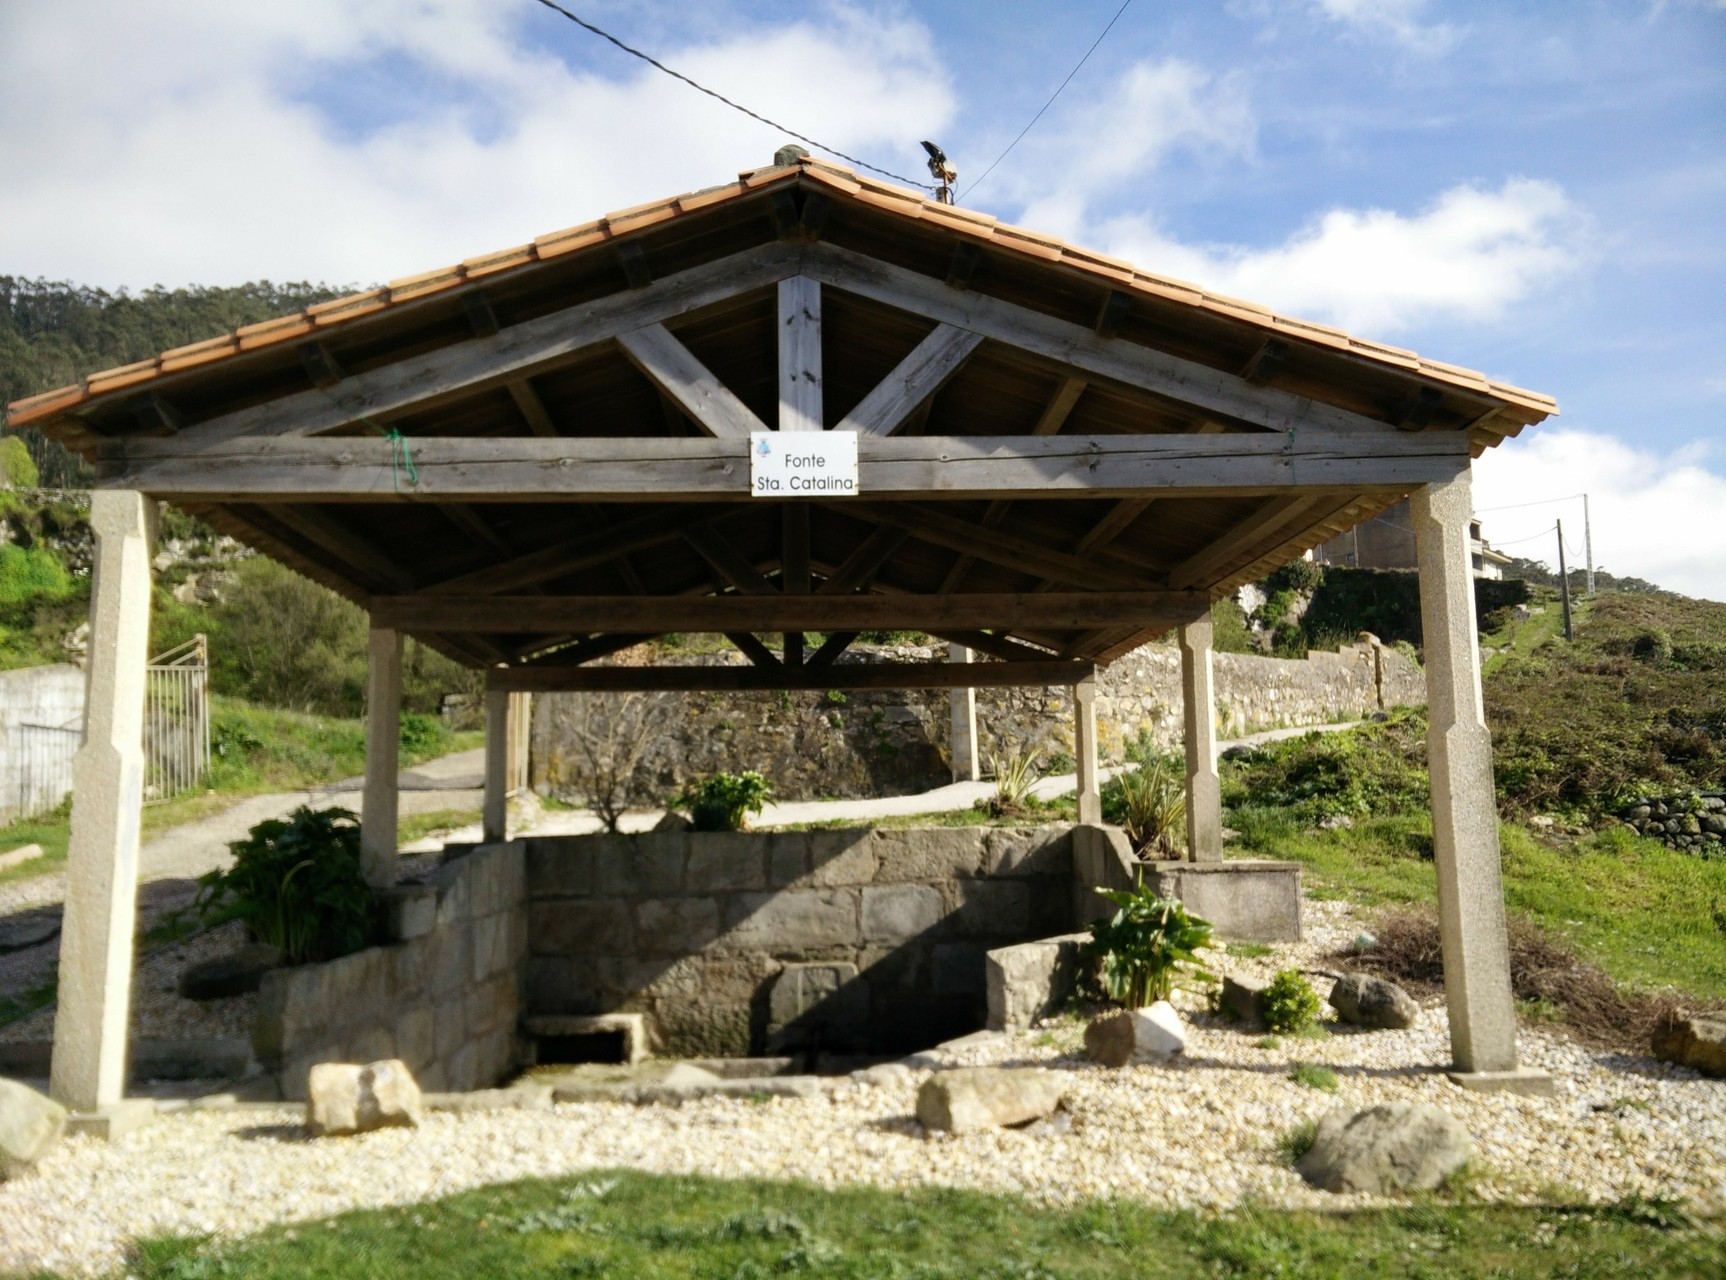 A Guarda (paseo costa), Pontevedra